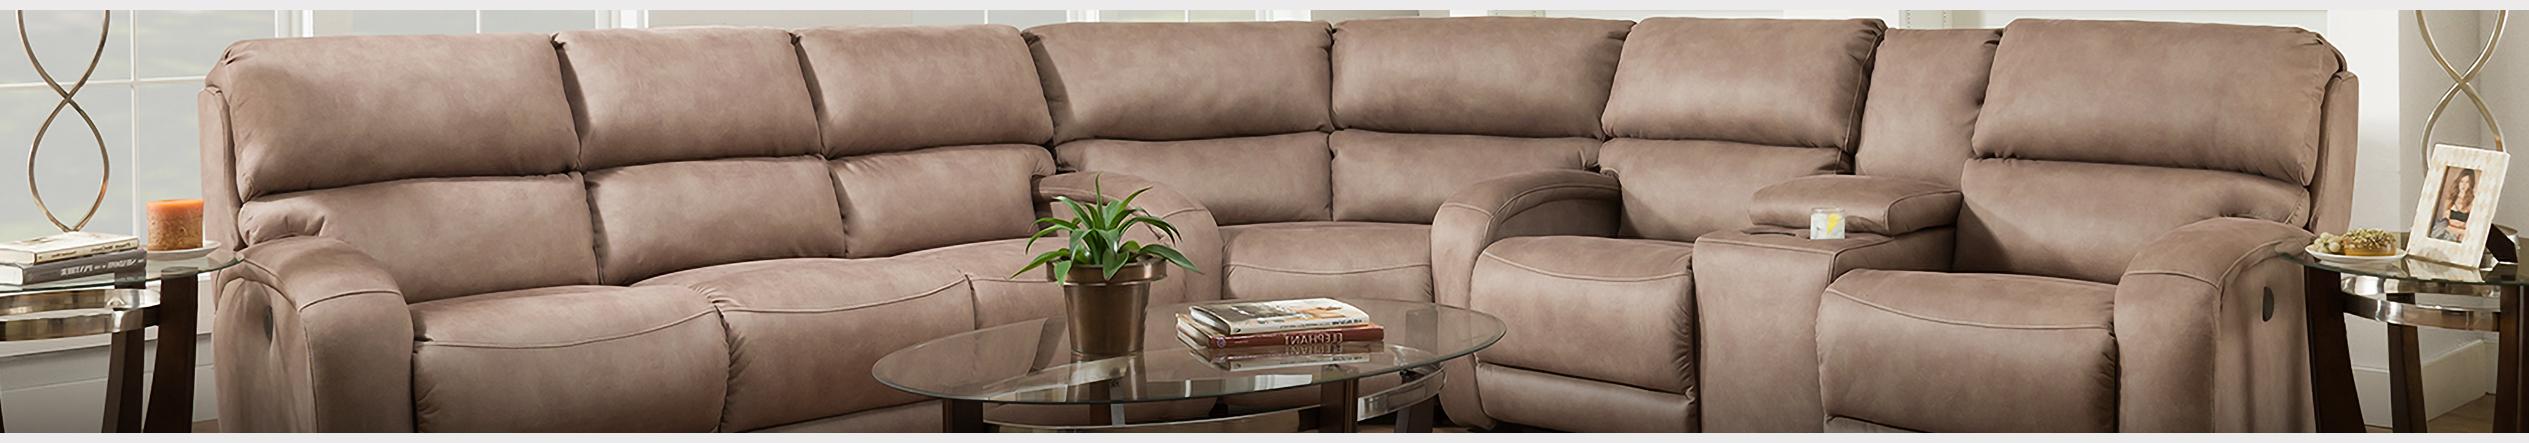 Prime Buy Recliners At Jordans Furniture Stores In Ma Nh Ri And Ct Inzonedesignstudio Interior Chair Design Inzonedesignstudiocom